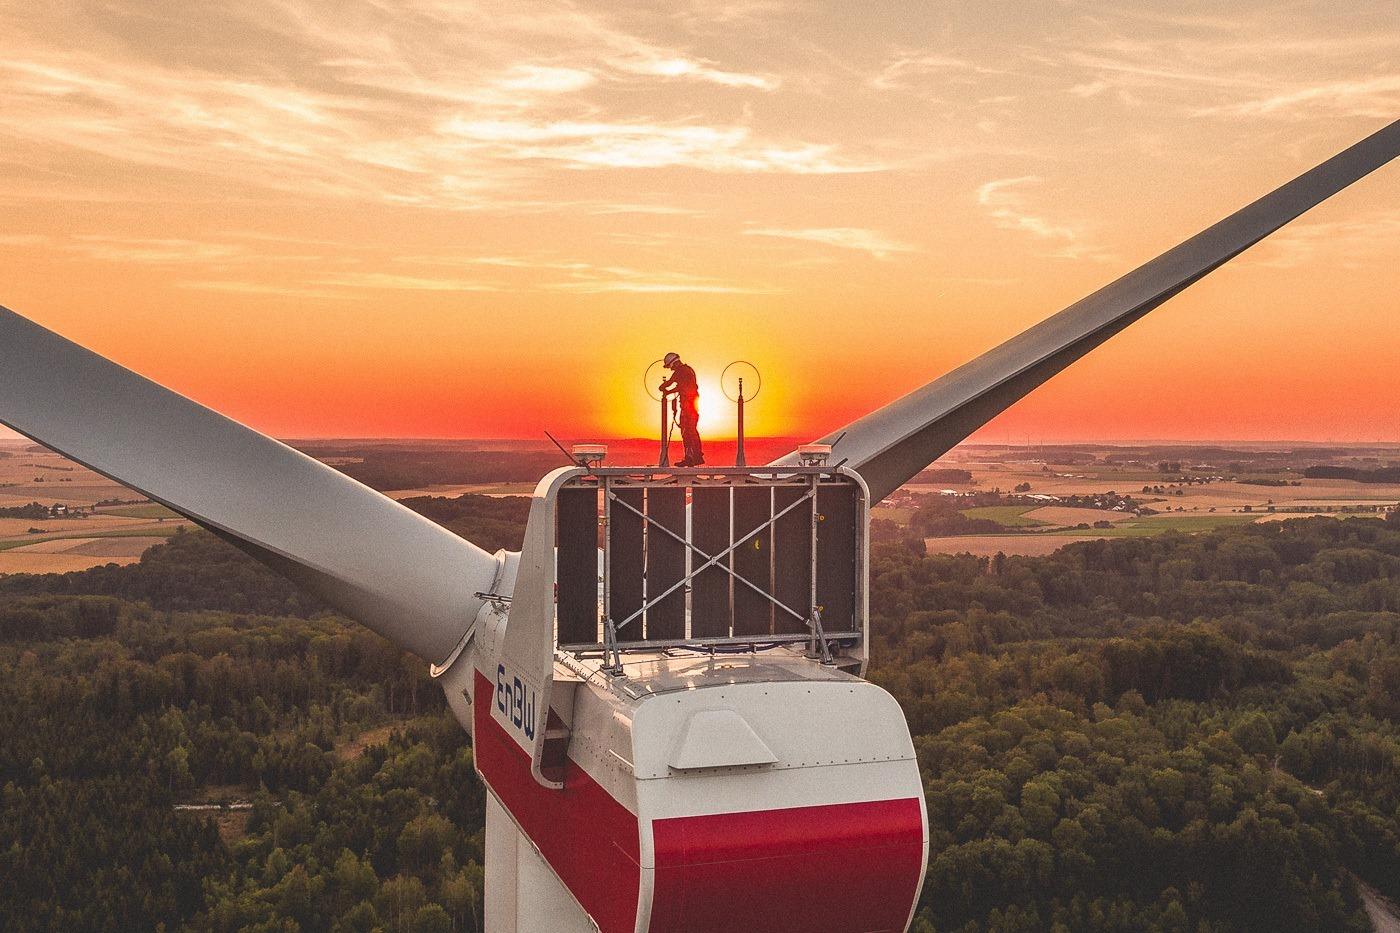 Development wind manager